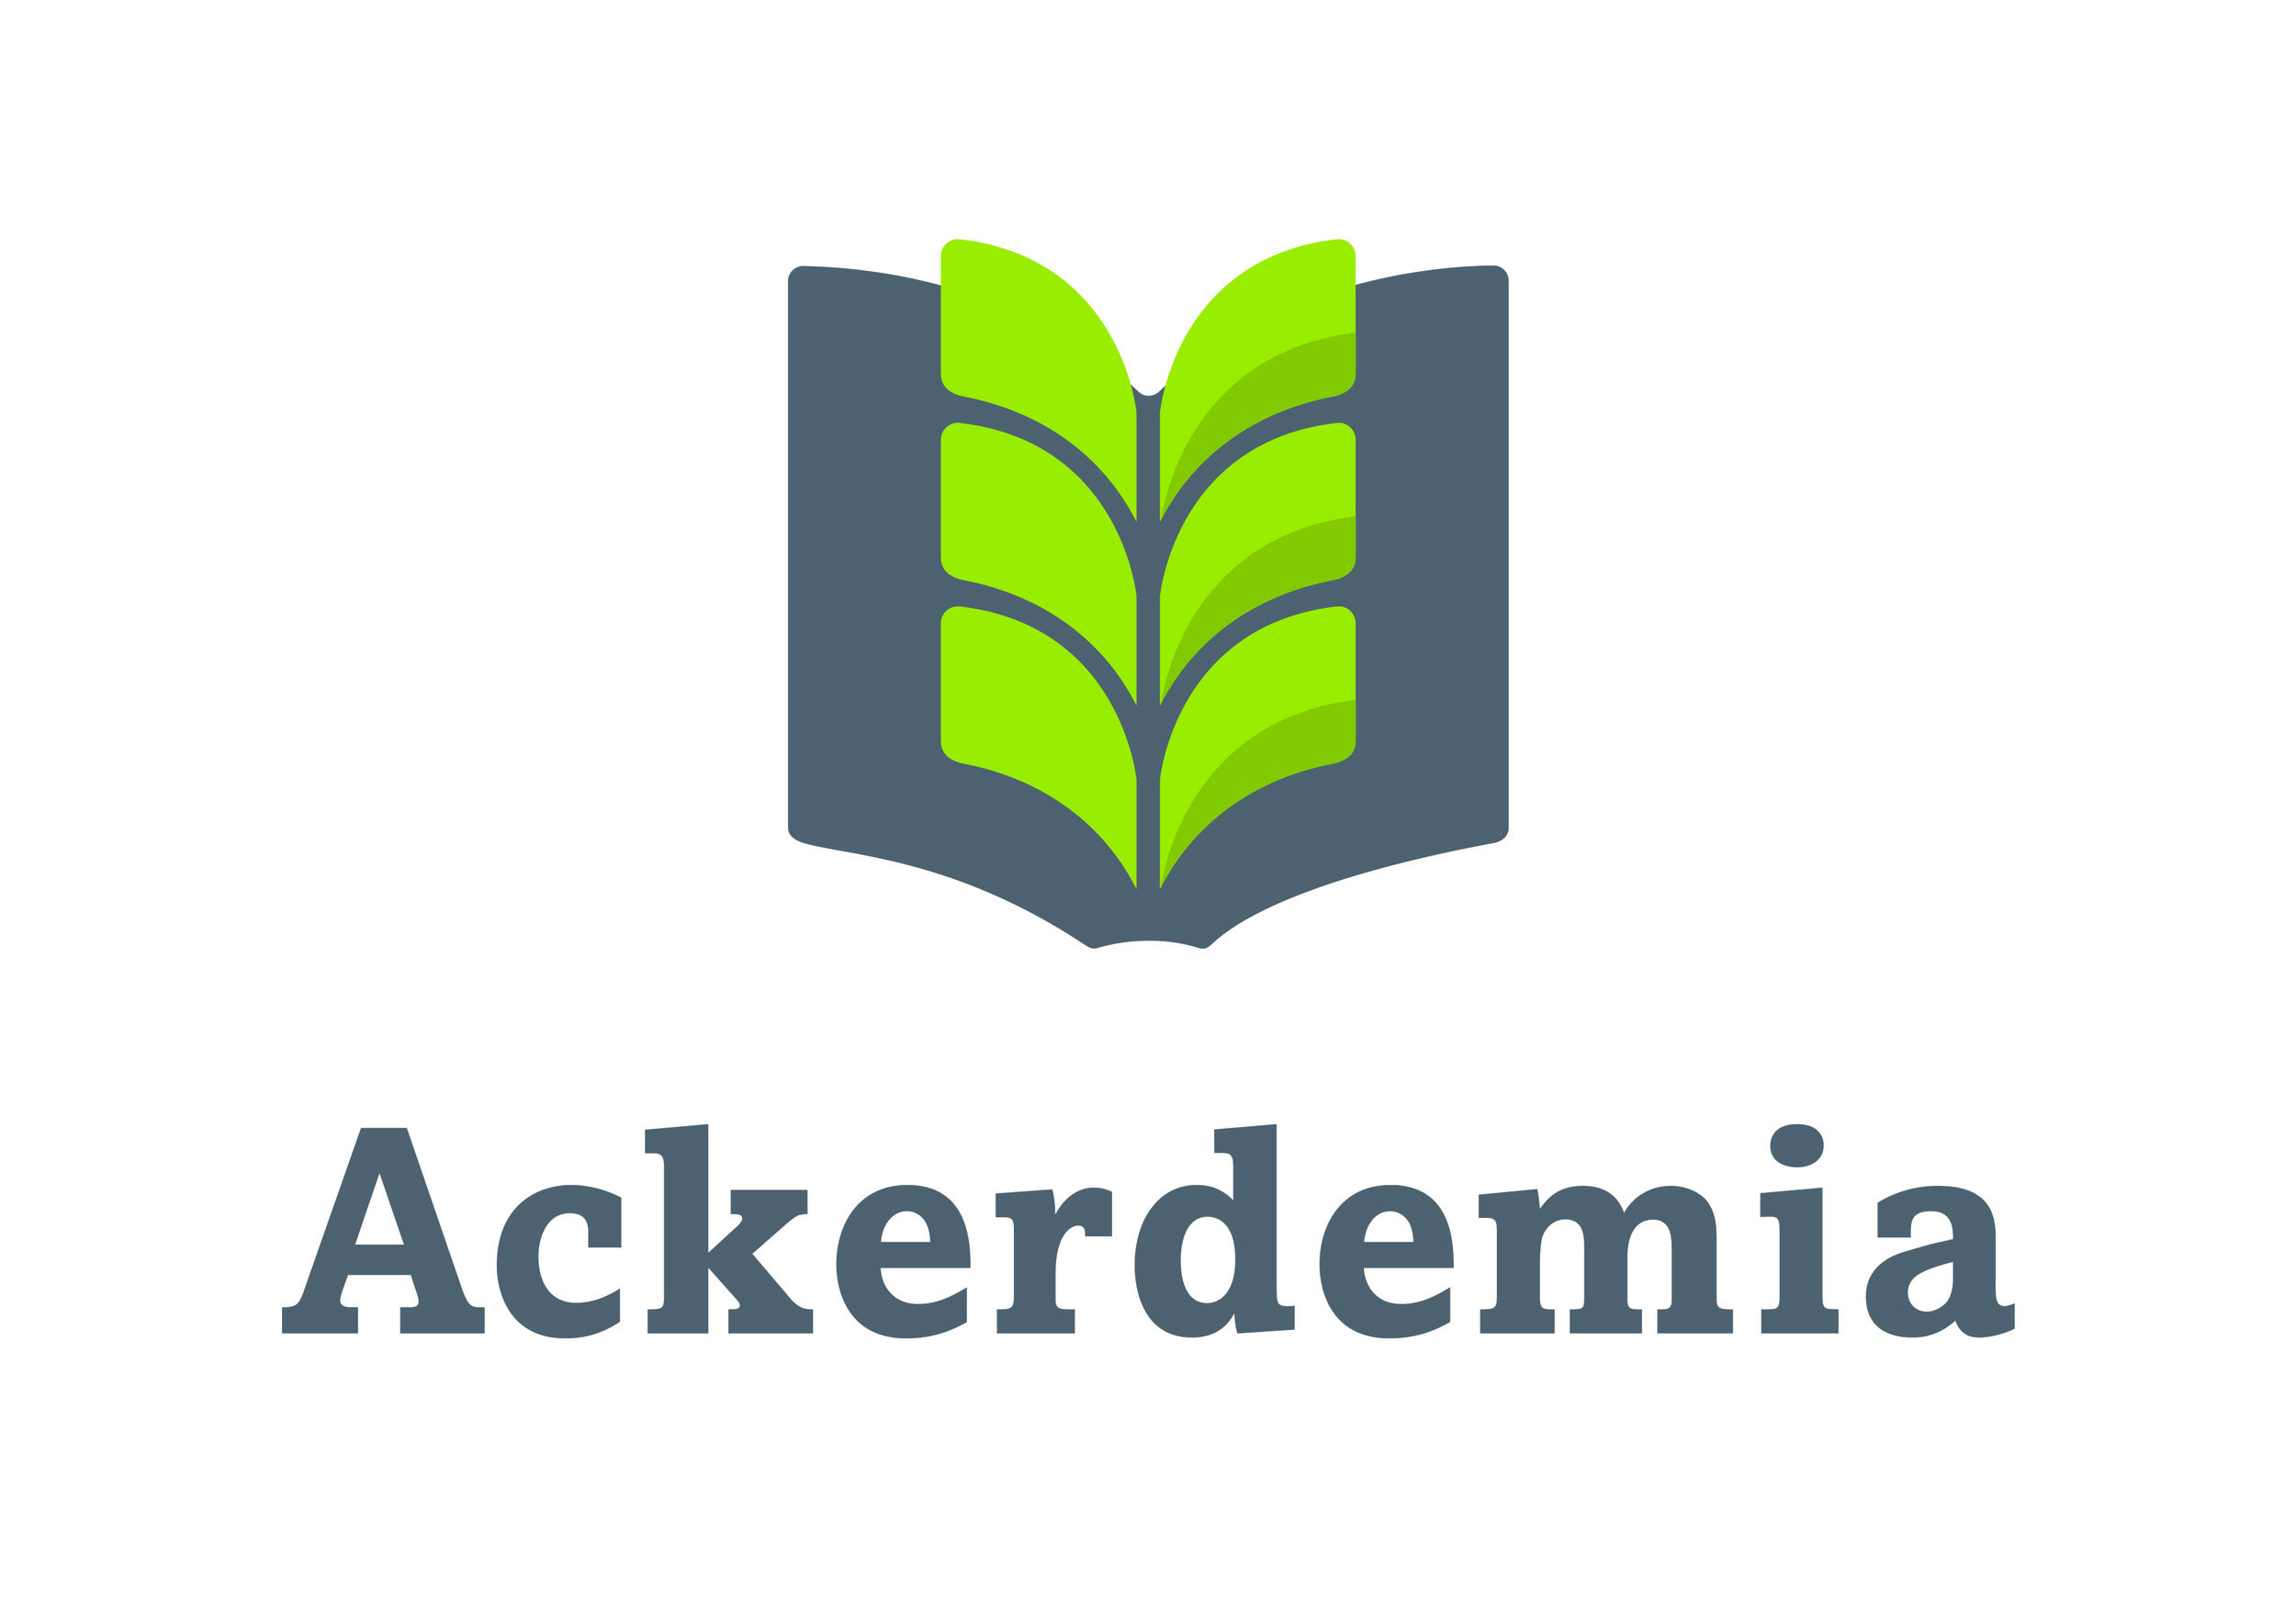 Ackerdemia_Logo_CMYK_pur_300dpi.jpg